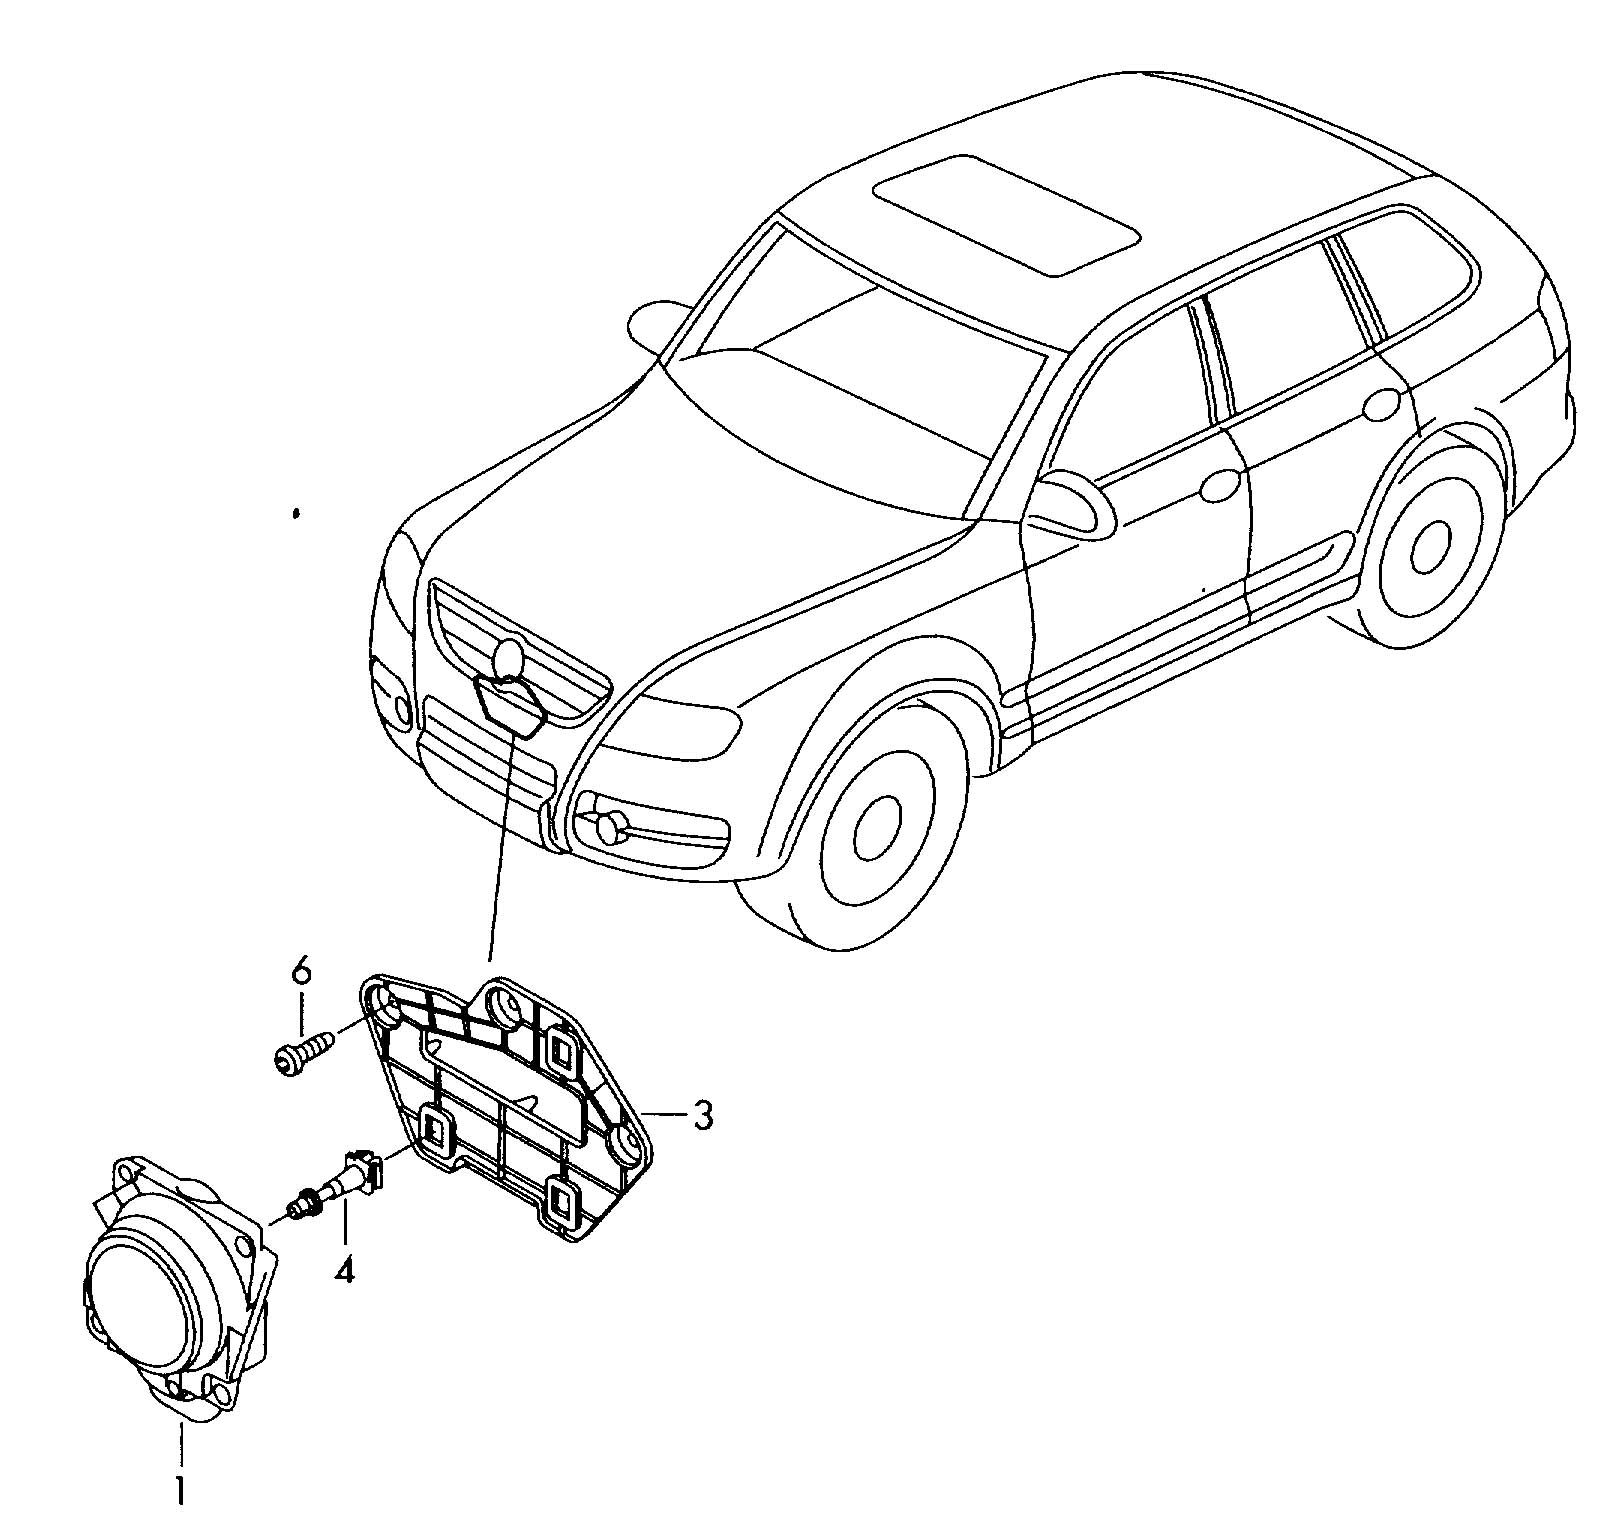 Volkswagen Atlanta: Volkswagen Touareg Radar Sensor Bracket Also Use